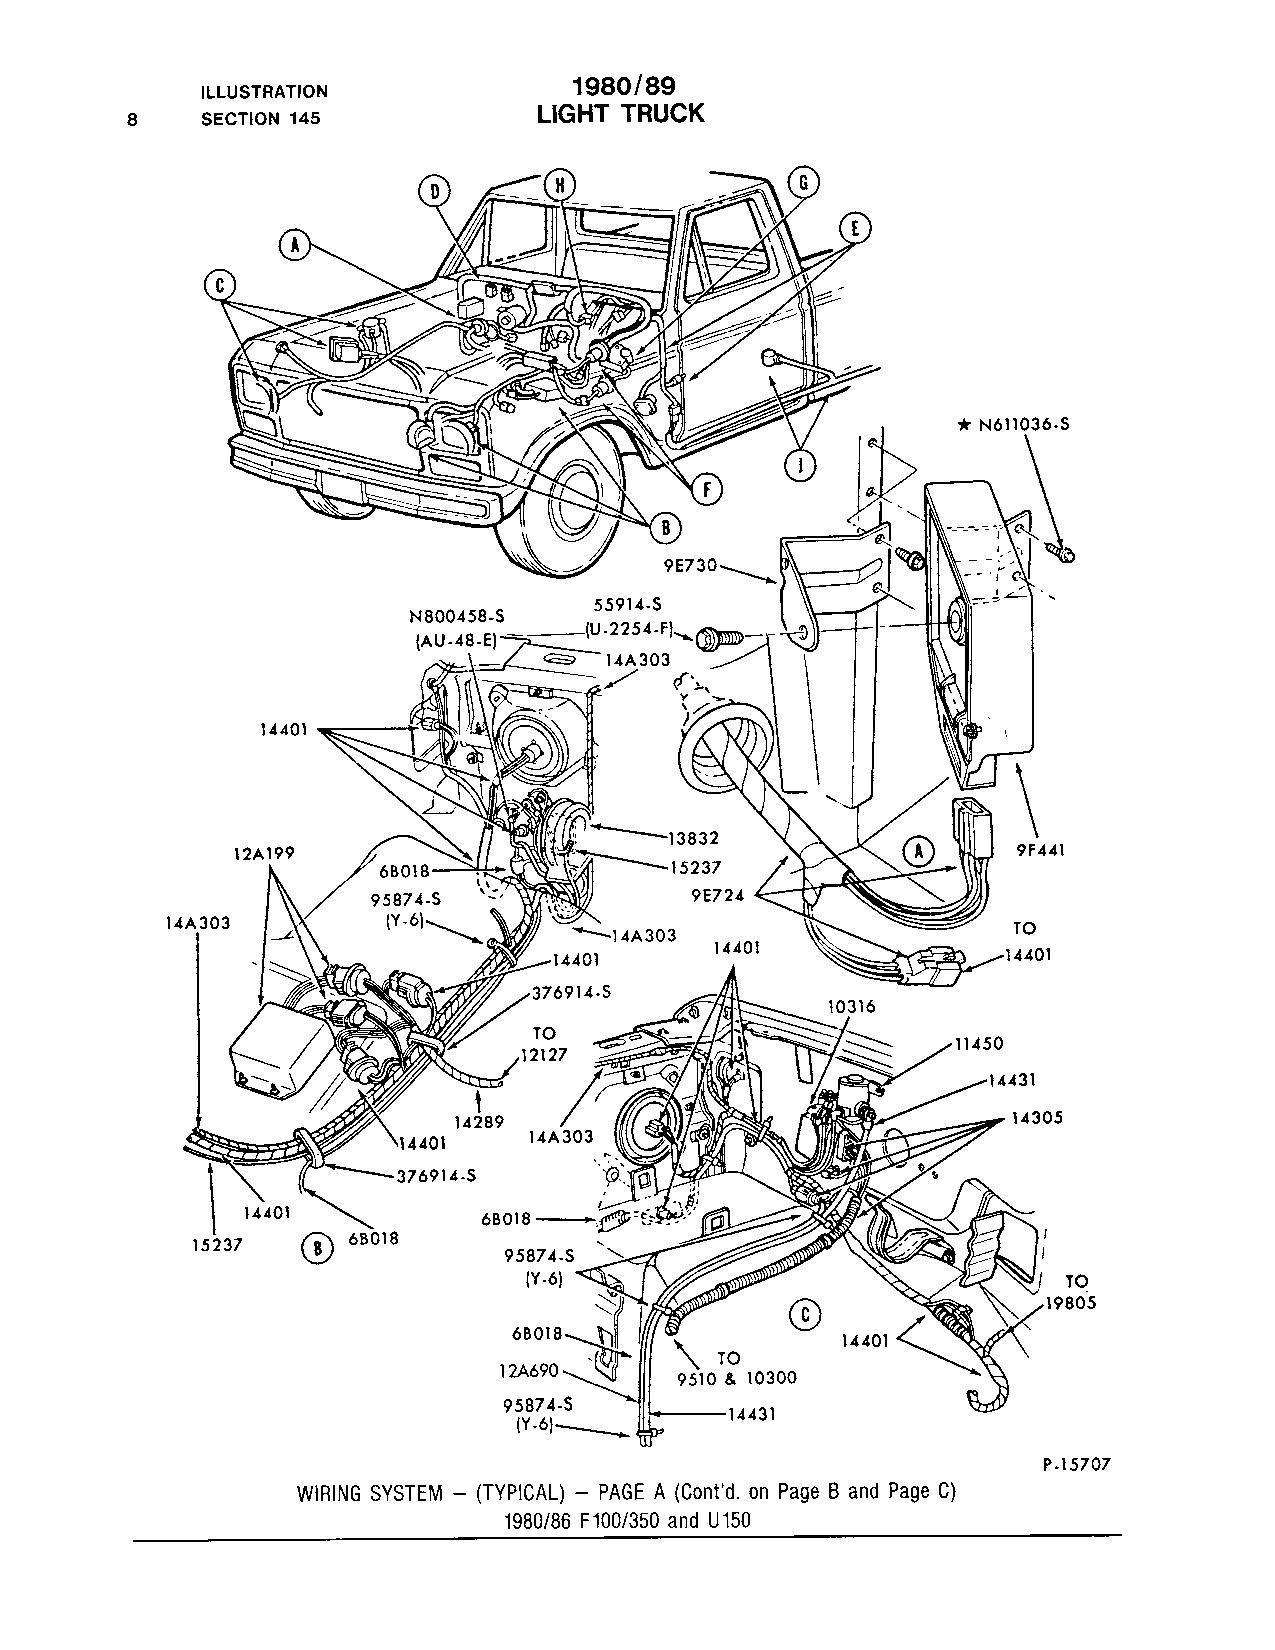 1986 f150 wire harness